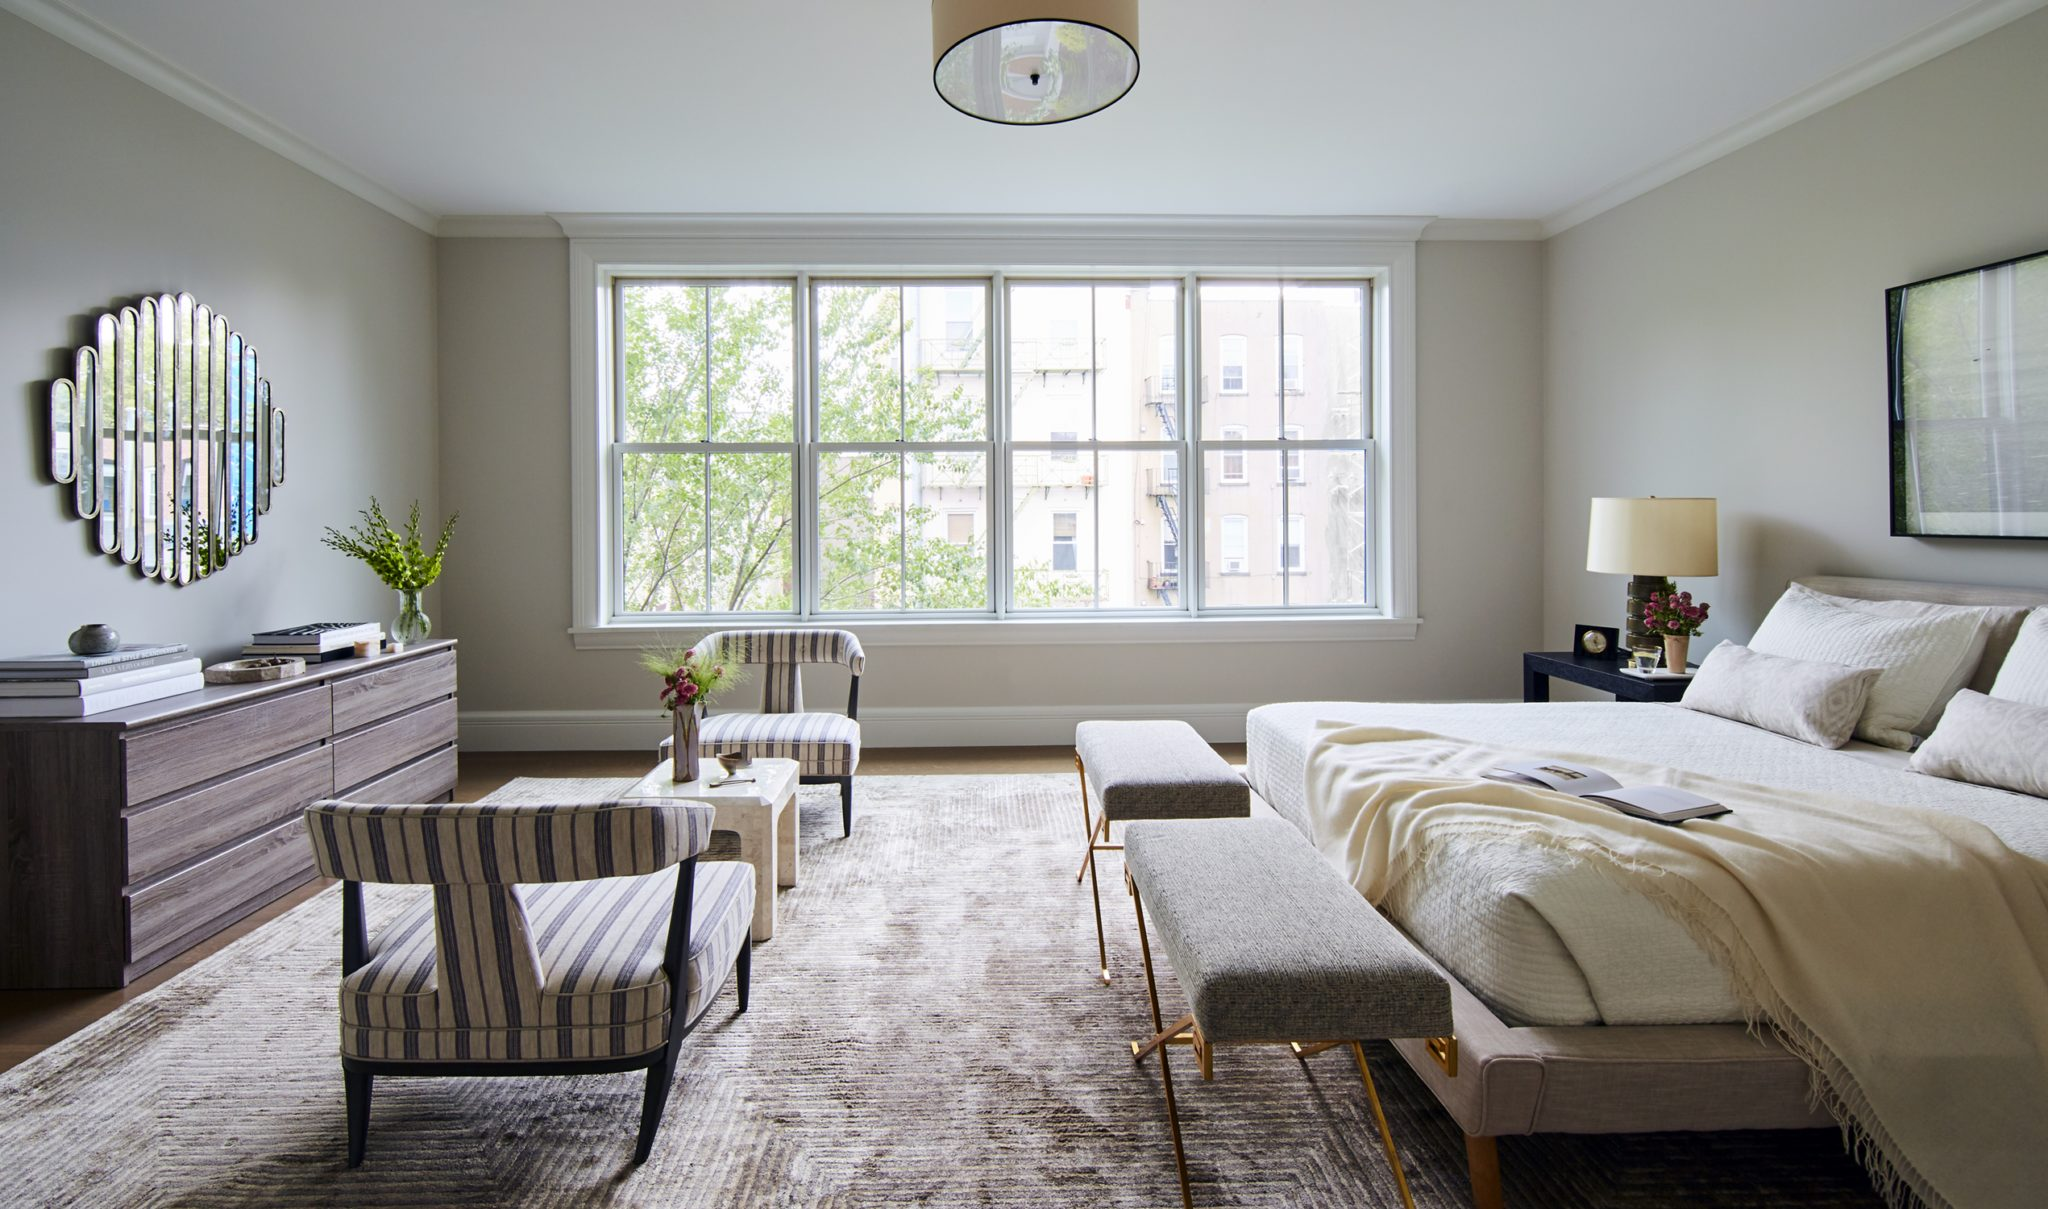 Bedroom in Hoboken, New Jersey,by J. PATRYCE DESIGN